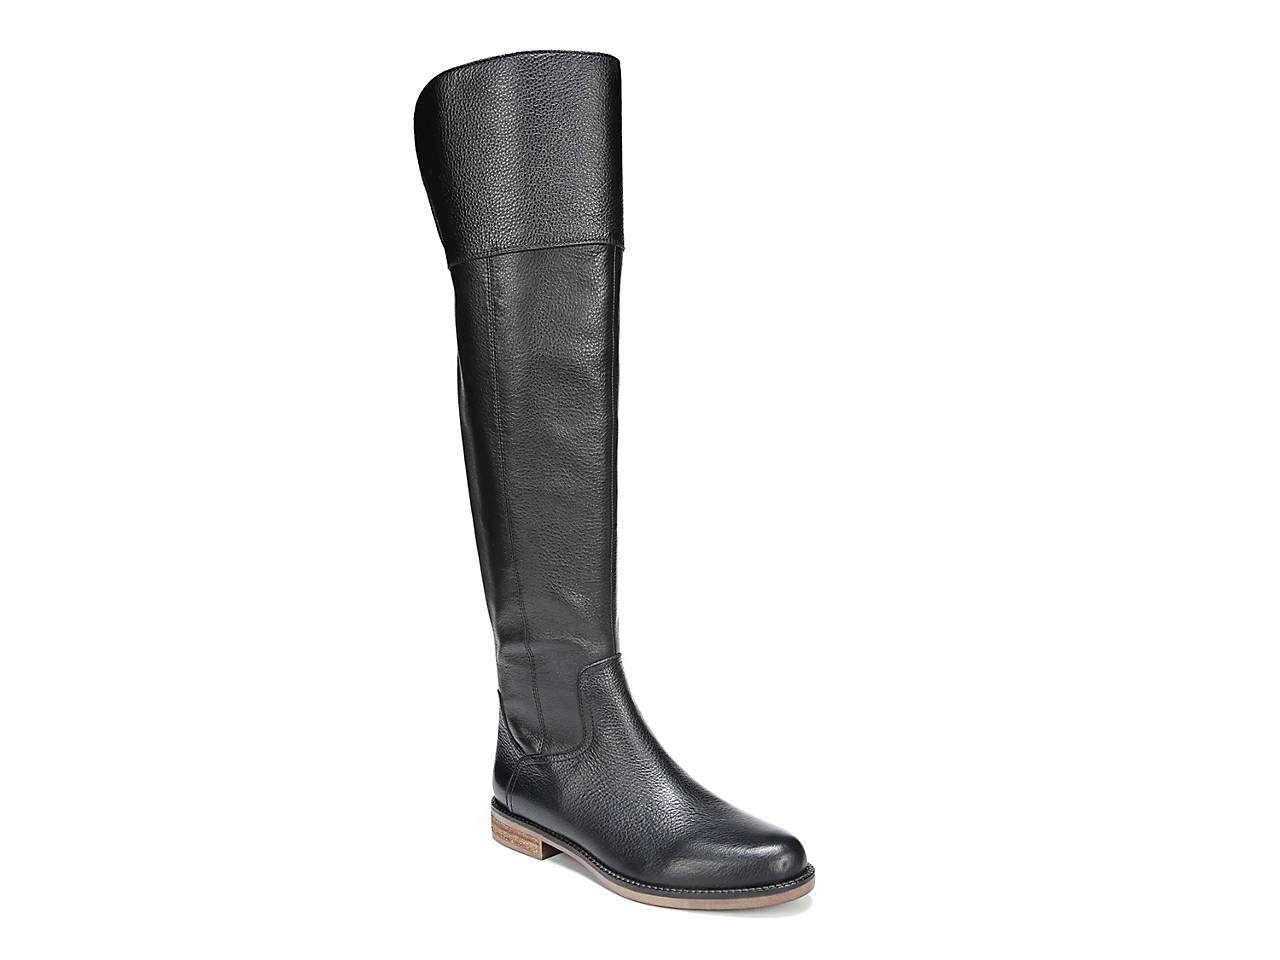 02e7980e053 Franco Sarto Carlisle Over The Knee Boot Women s Shoes